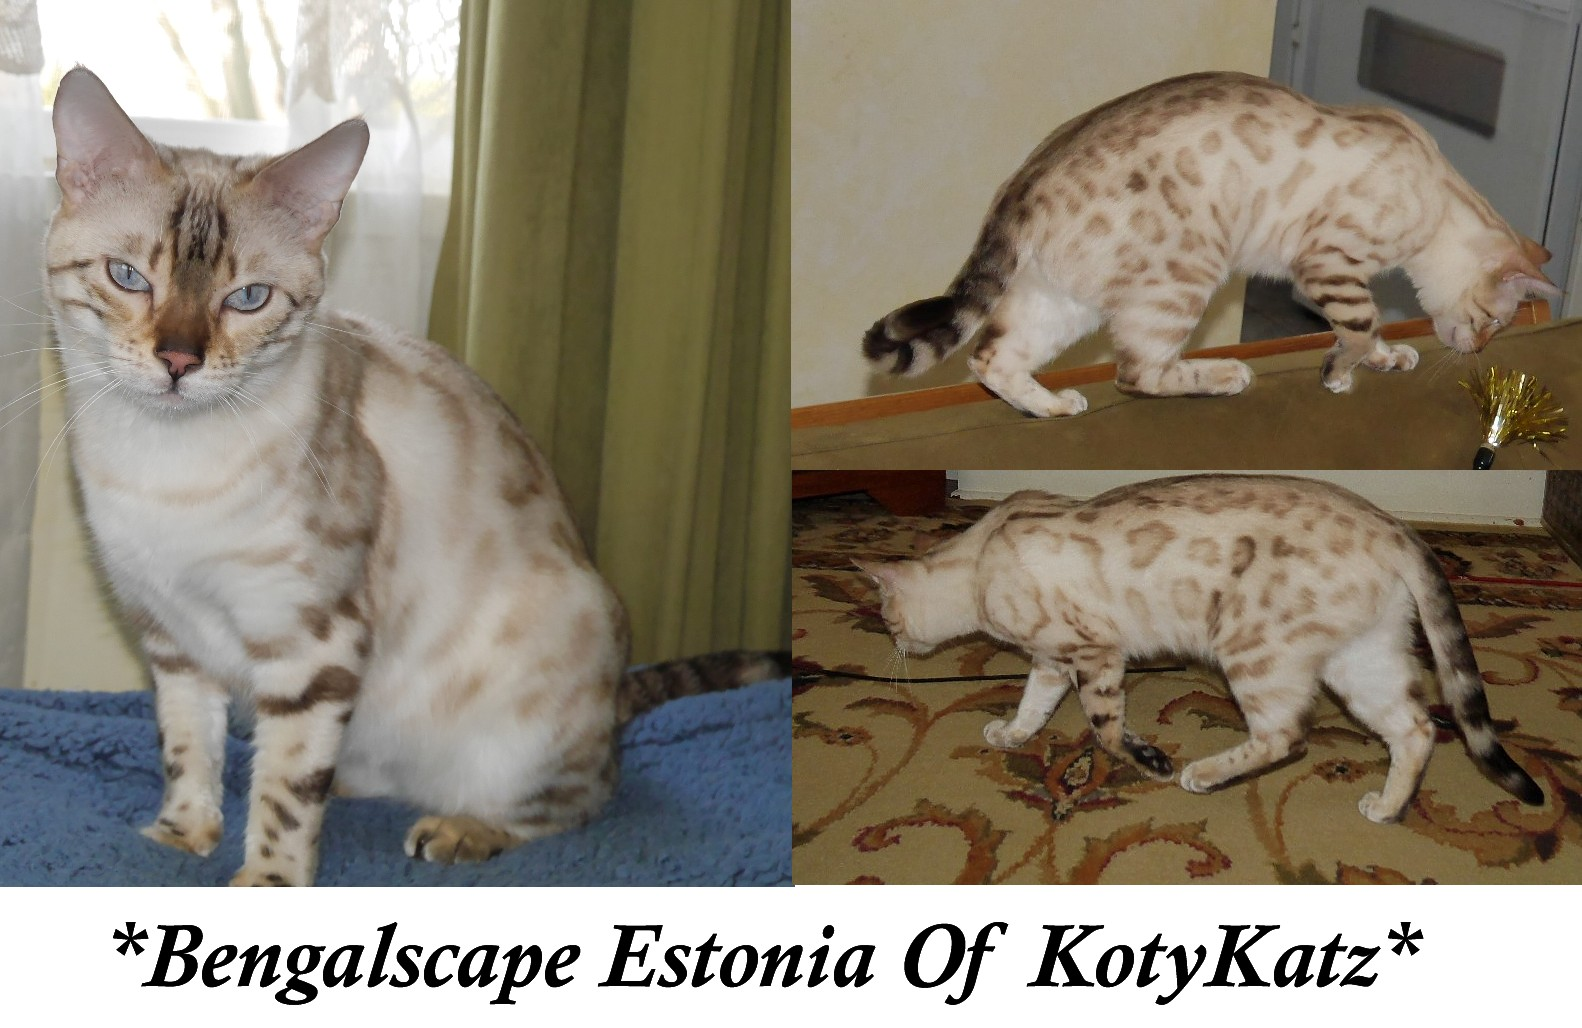 Bengalscape Estonia Of KotyKatz